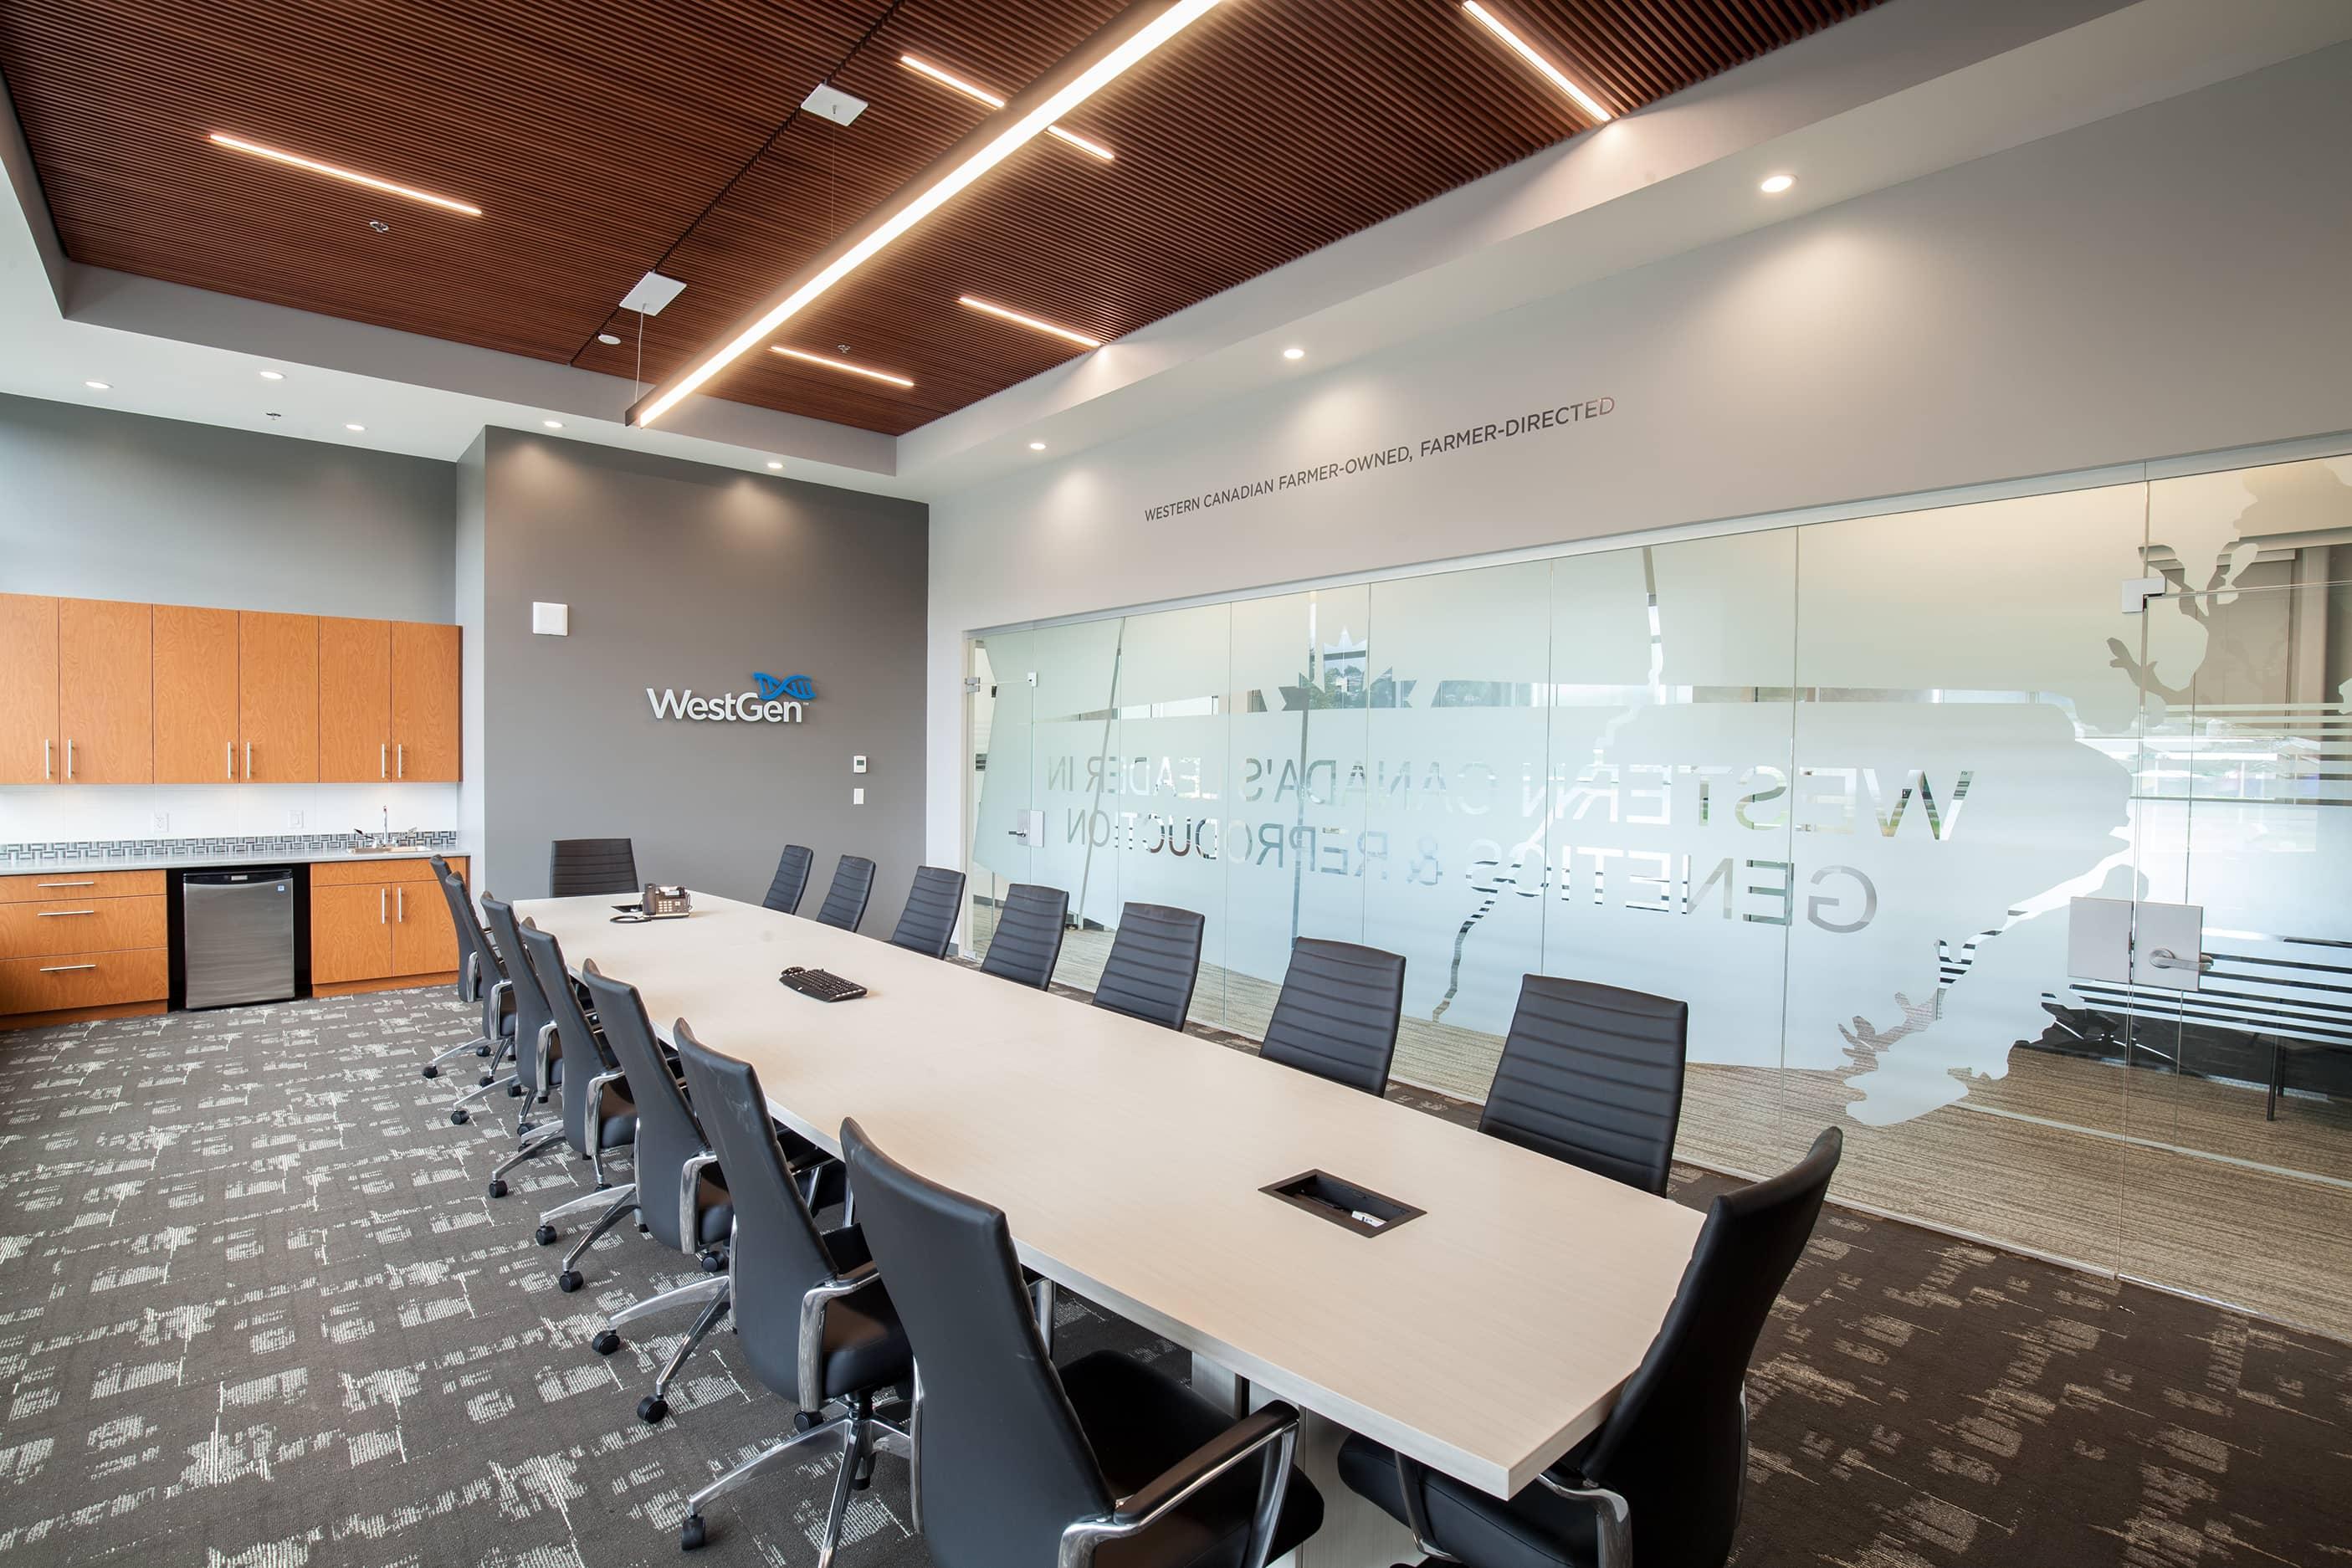 bbp westgen office and laboratory meeting room